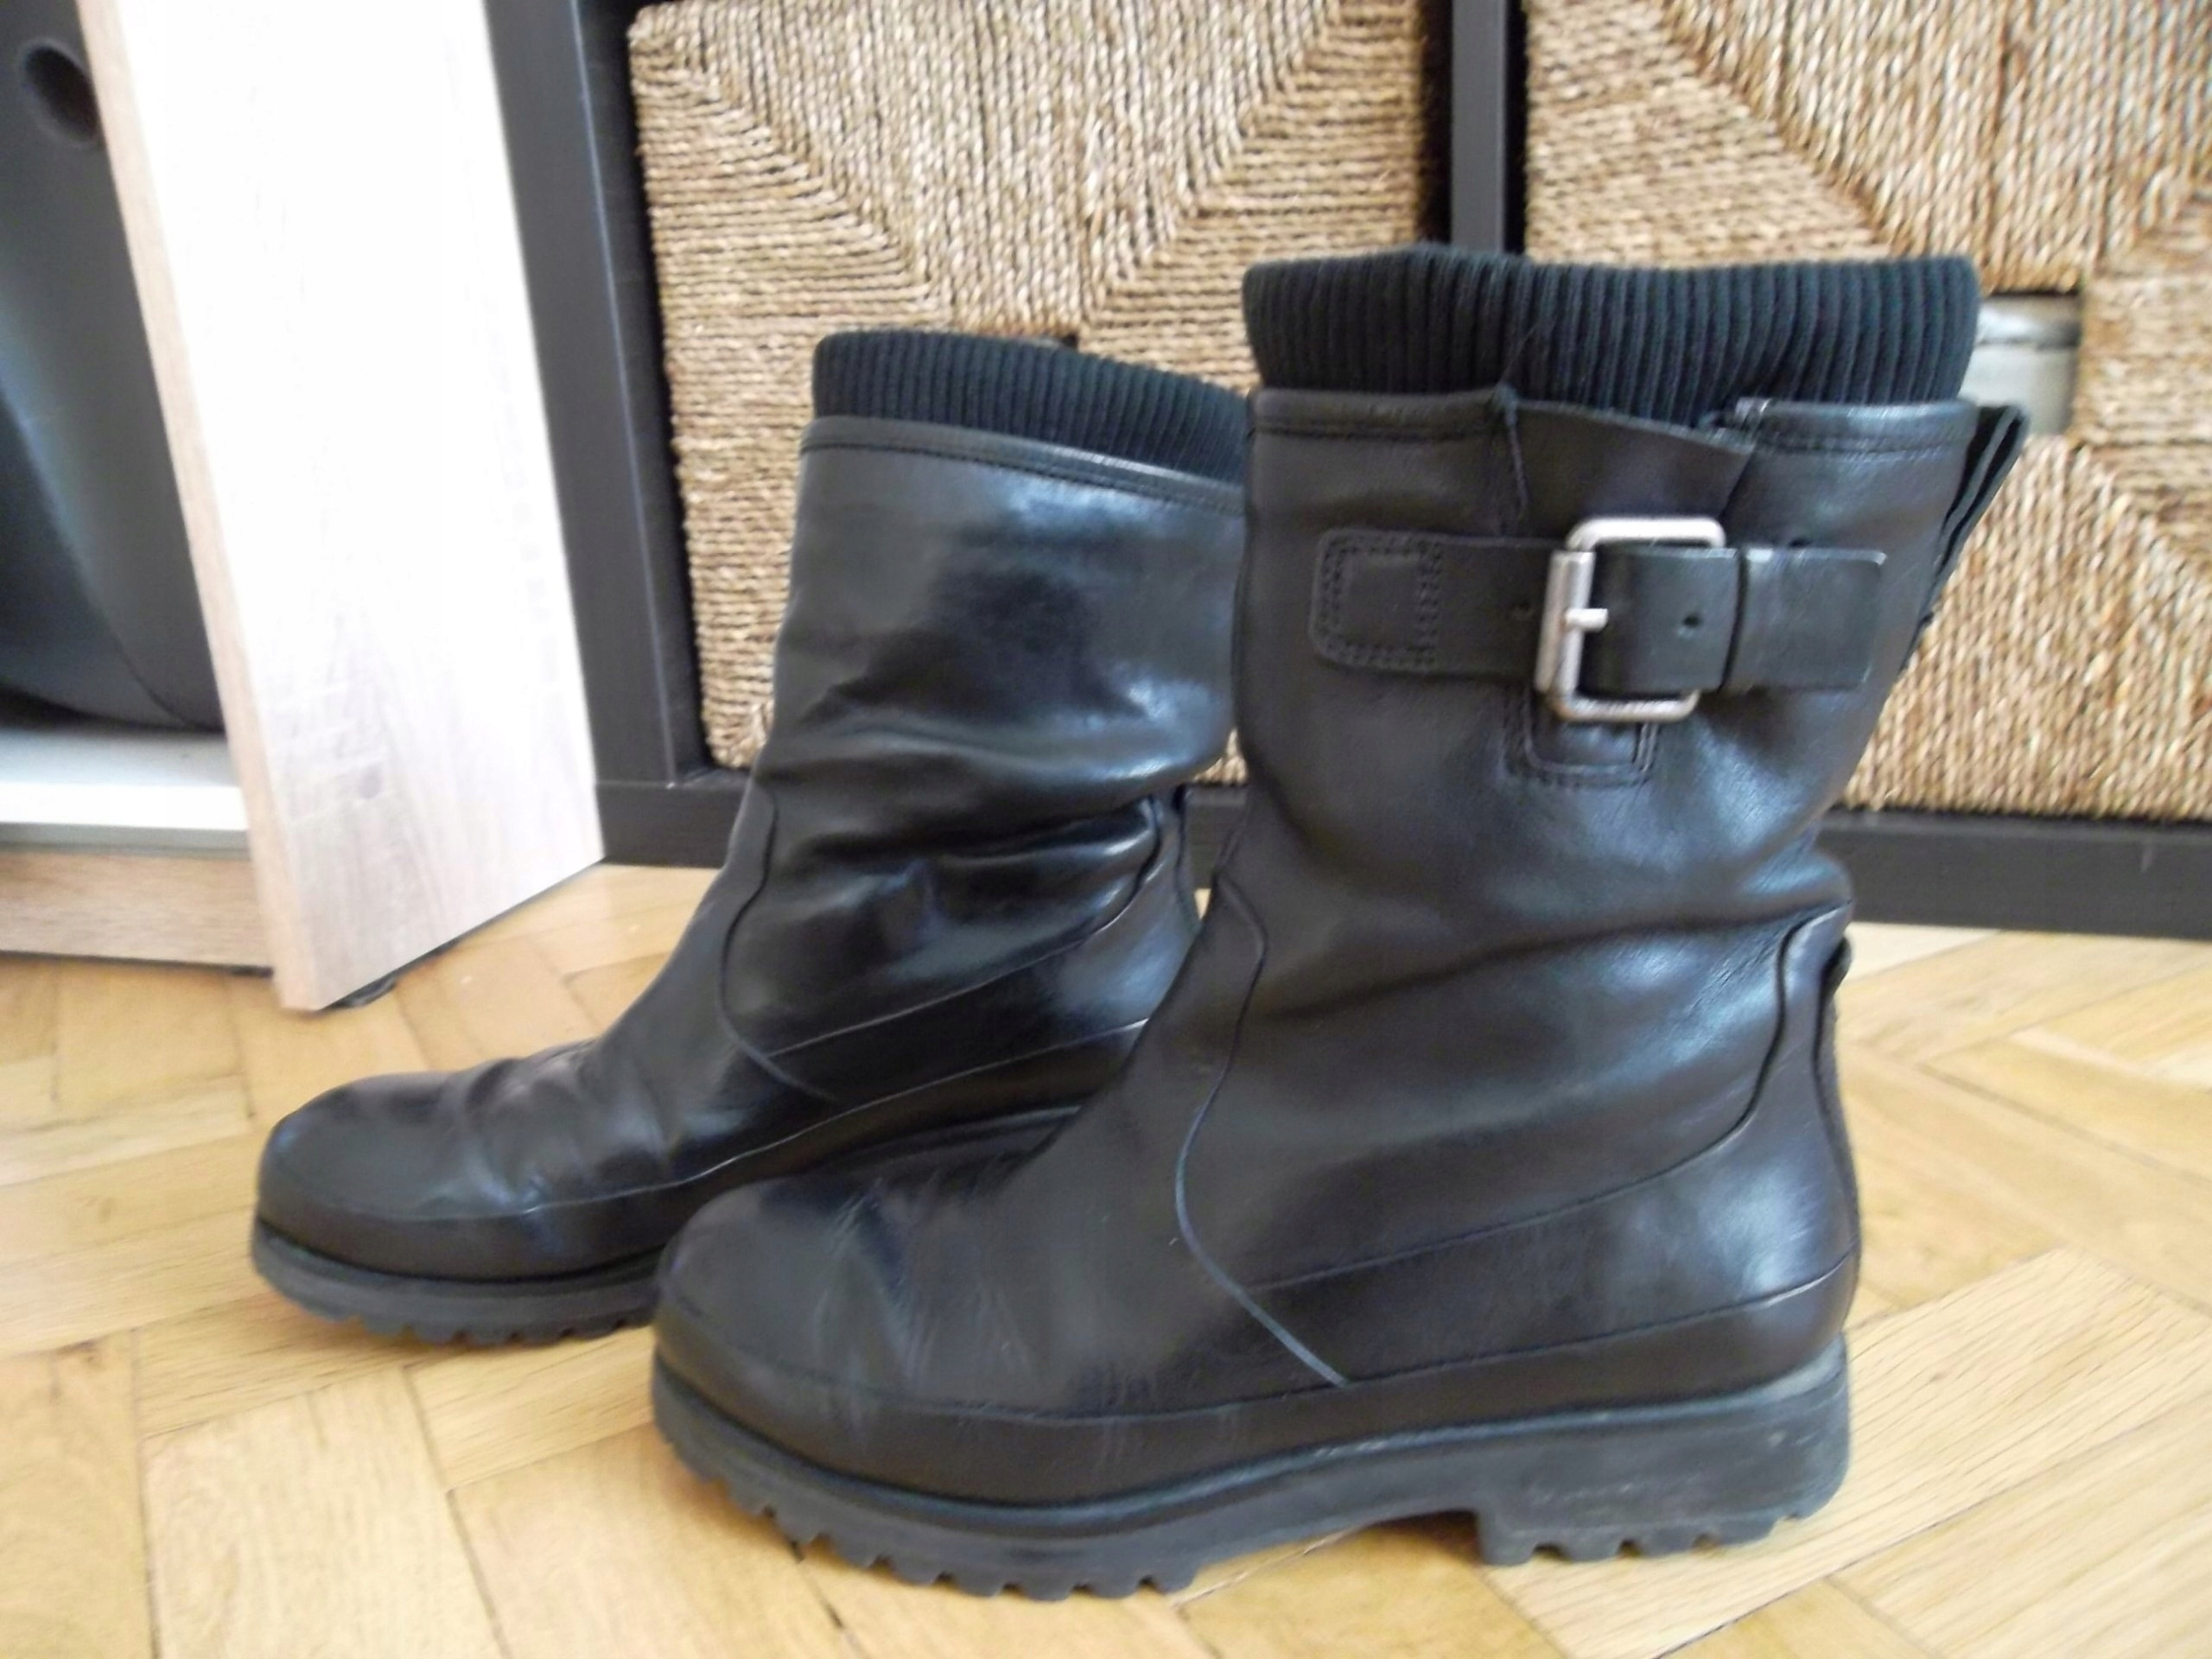 a4e76bd4 ECCO skóra buty motor shoes jesień zima 36 TANIO!! - 7591387748 ...